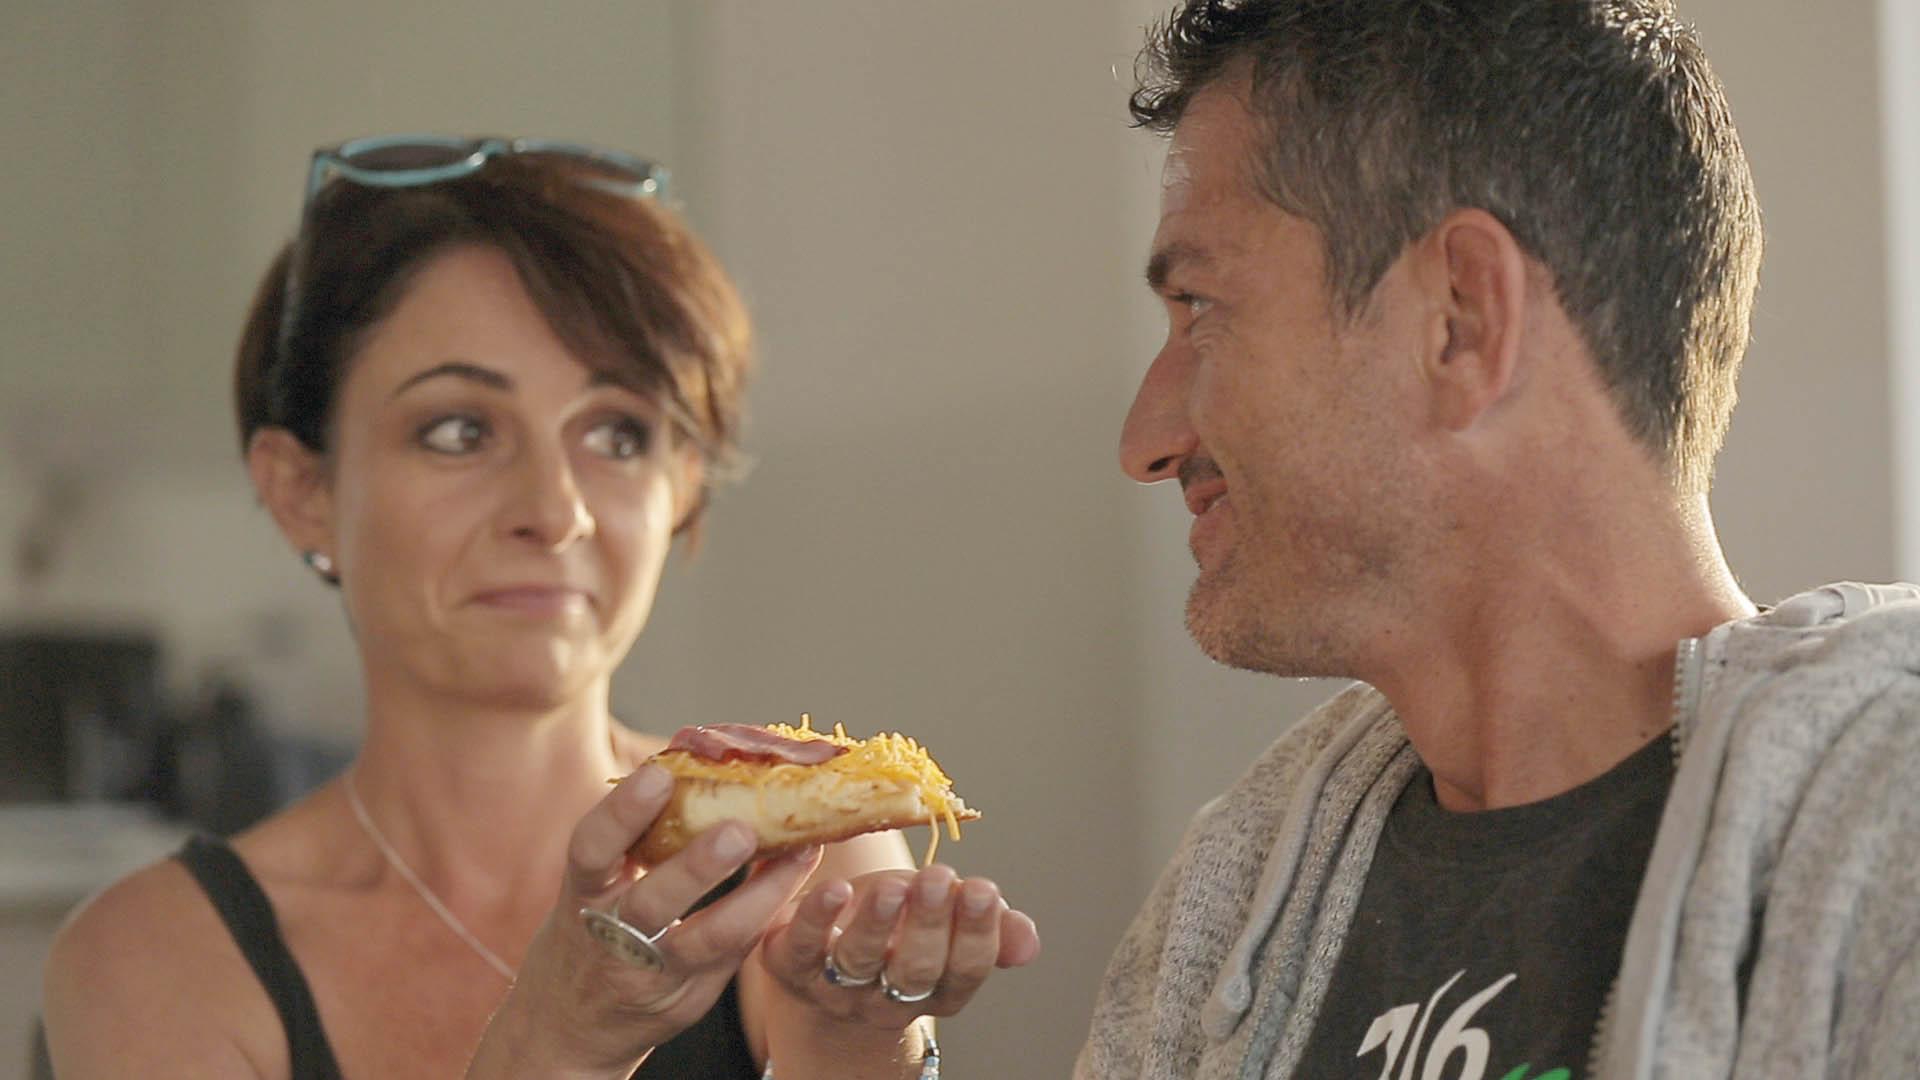 Odette en Joost tydens verfilming